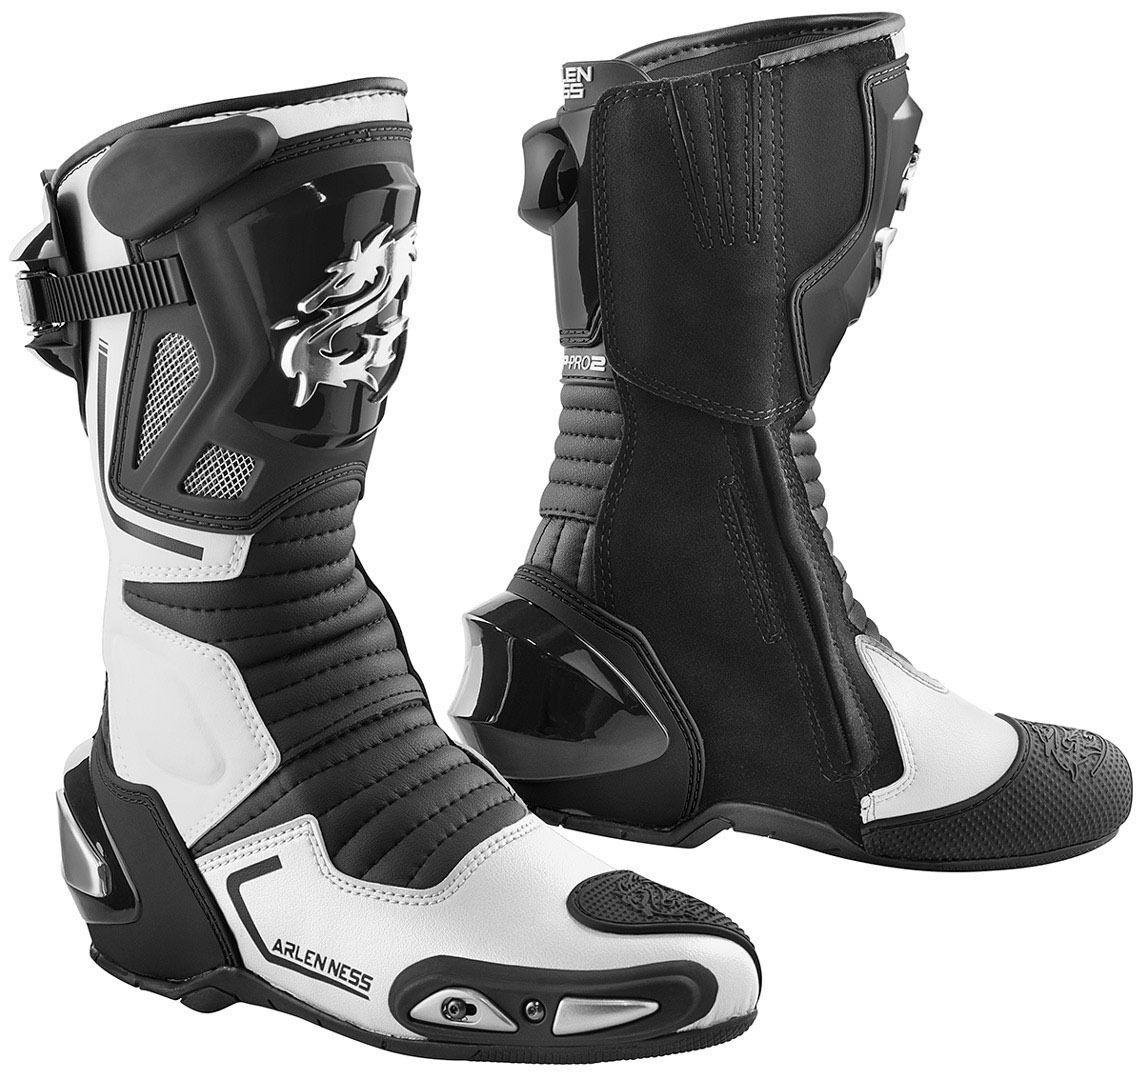 Arlen Ness Sugello Bottes de moto Noir Blanc taille : 39